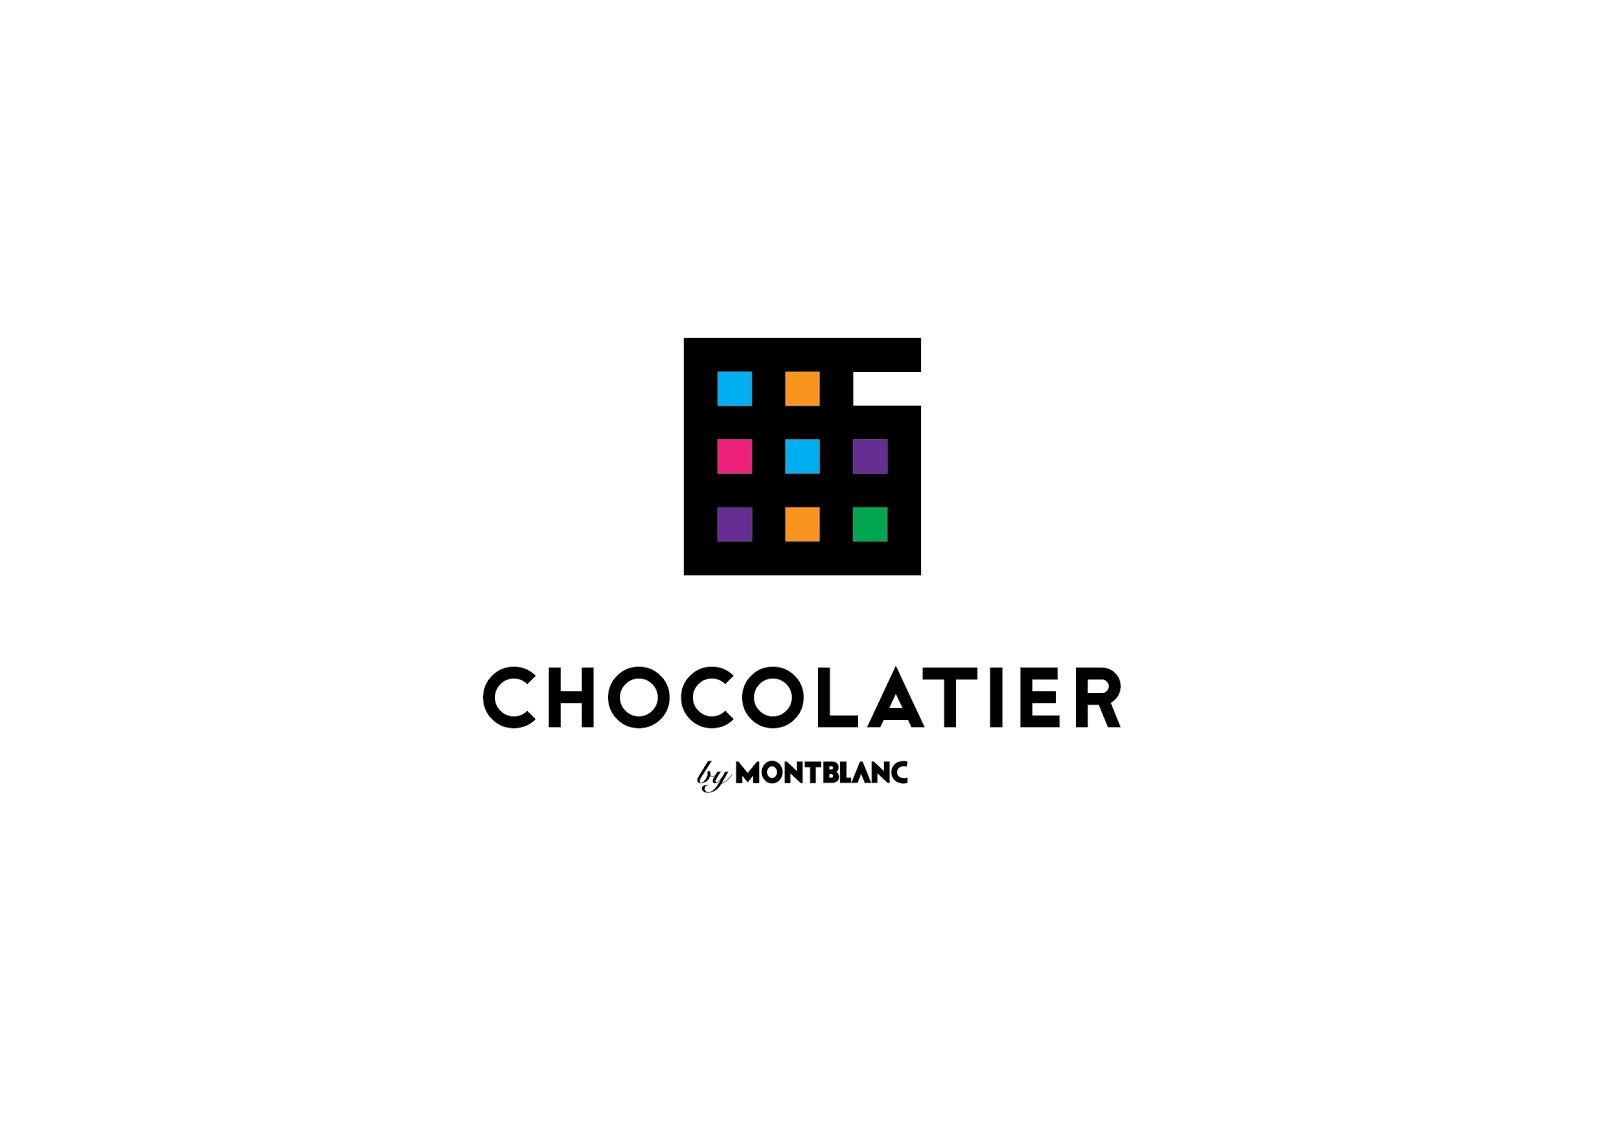 L chocolatier logo